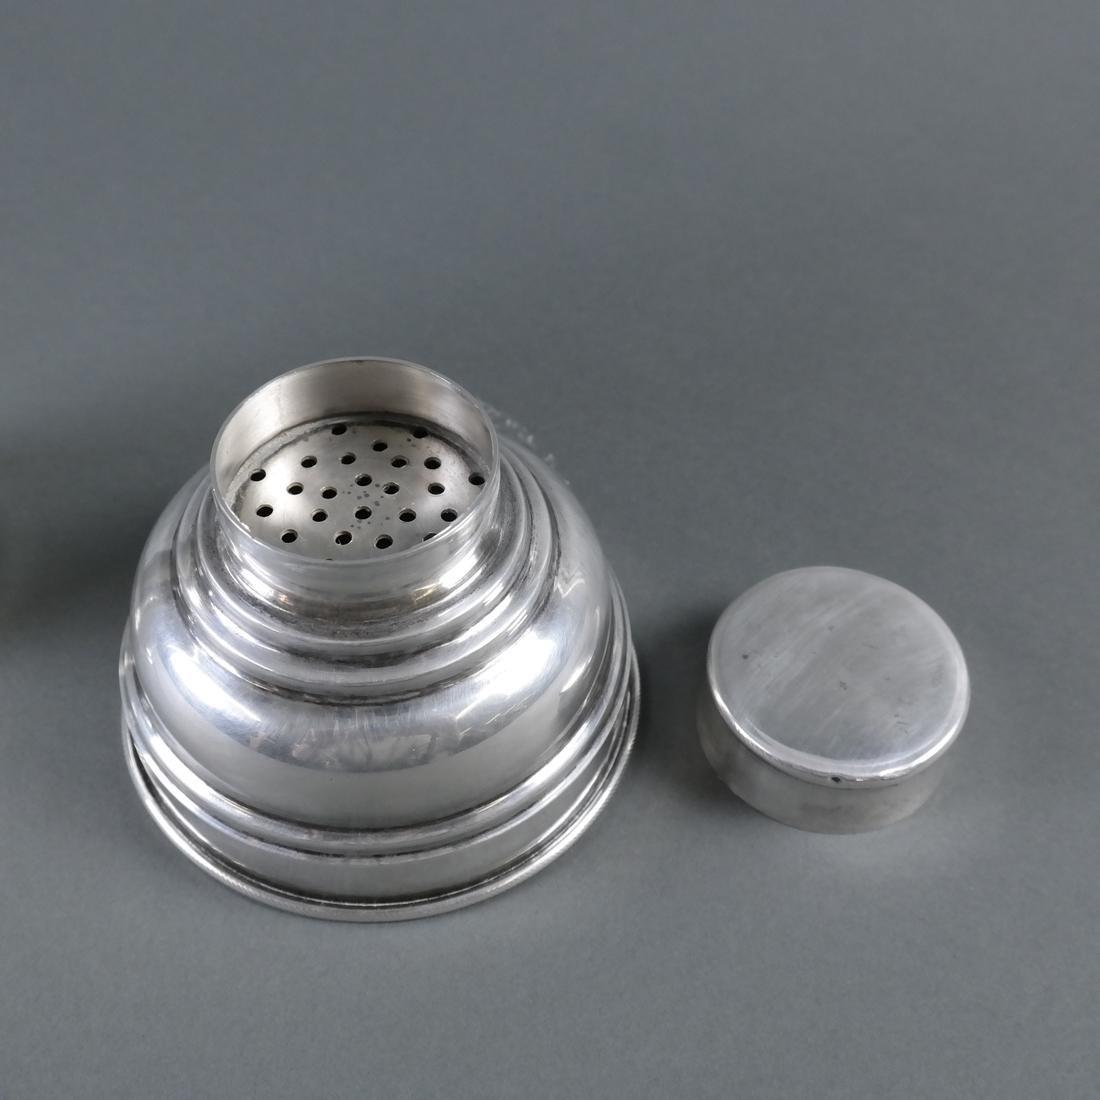 .900 Standard Silver Cocktail Shaker - 3